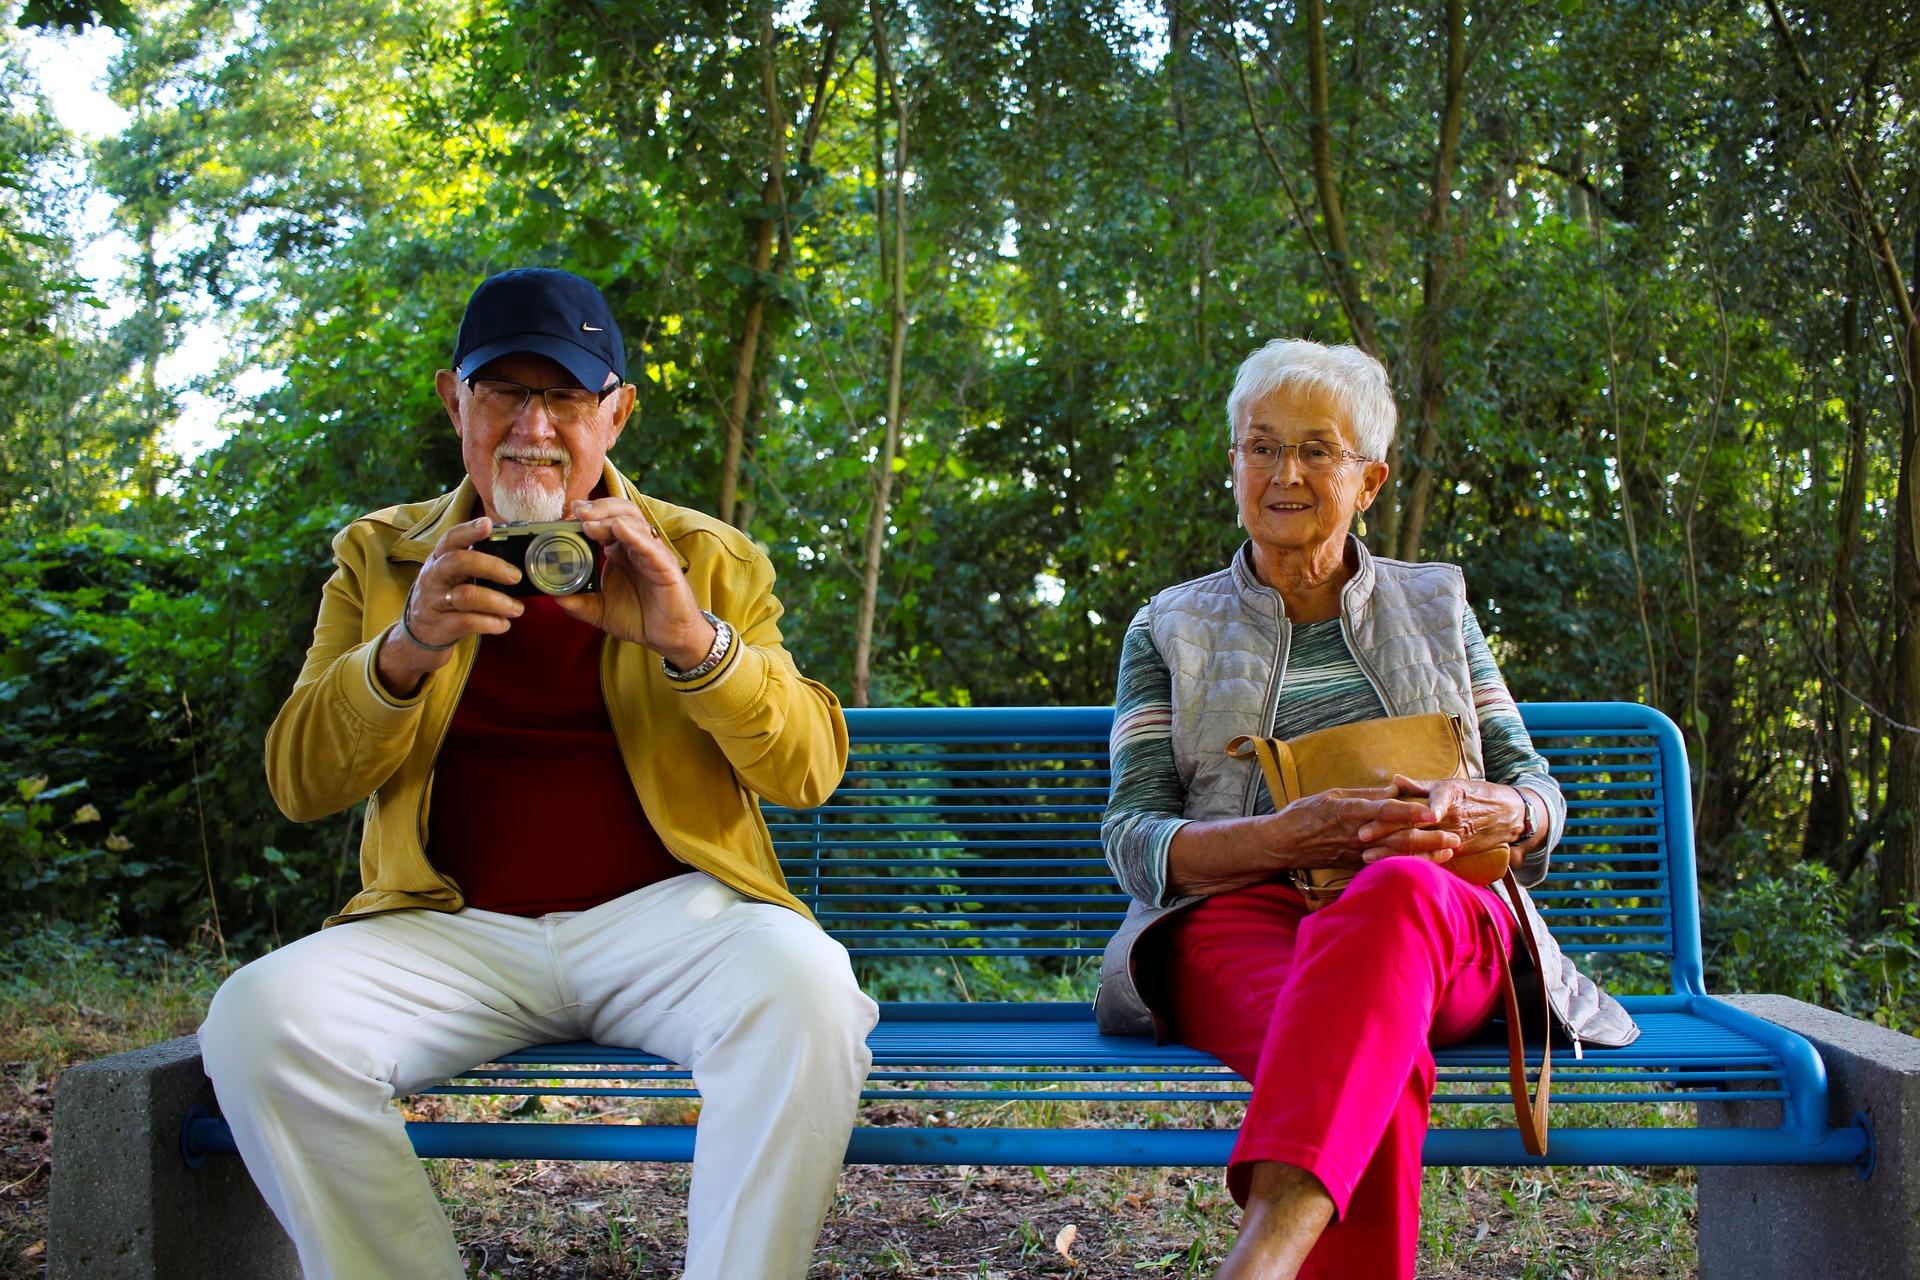 rizikos grupe senjorai